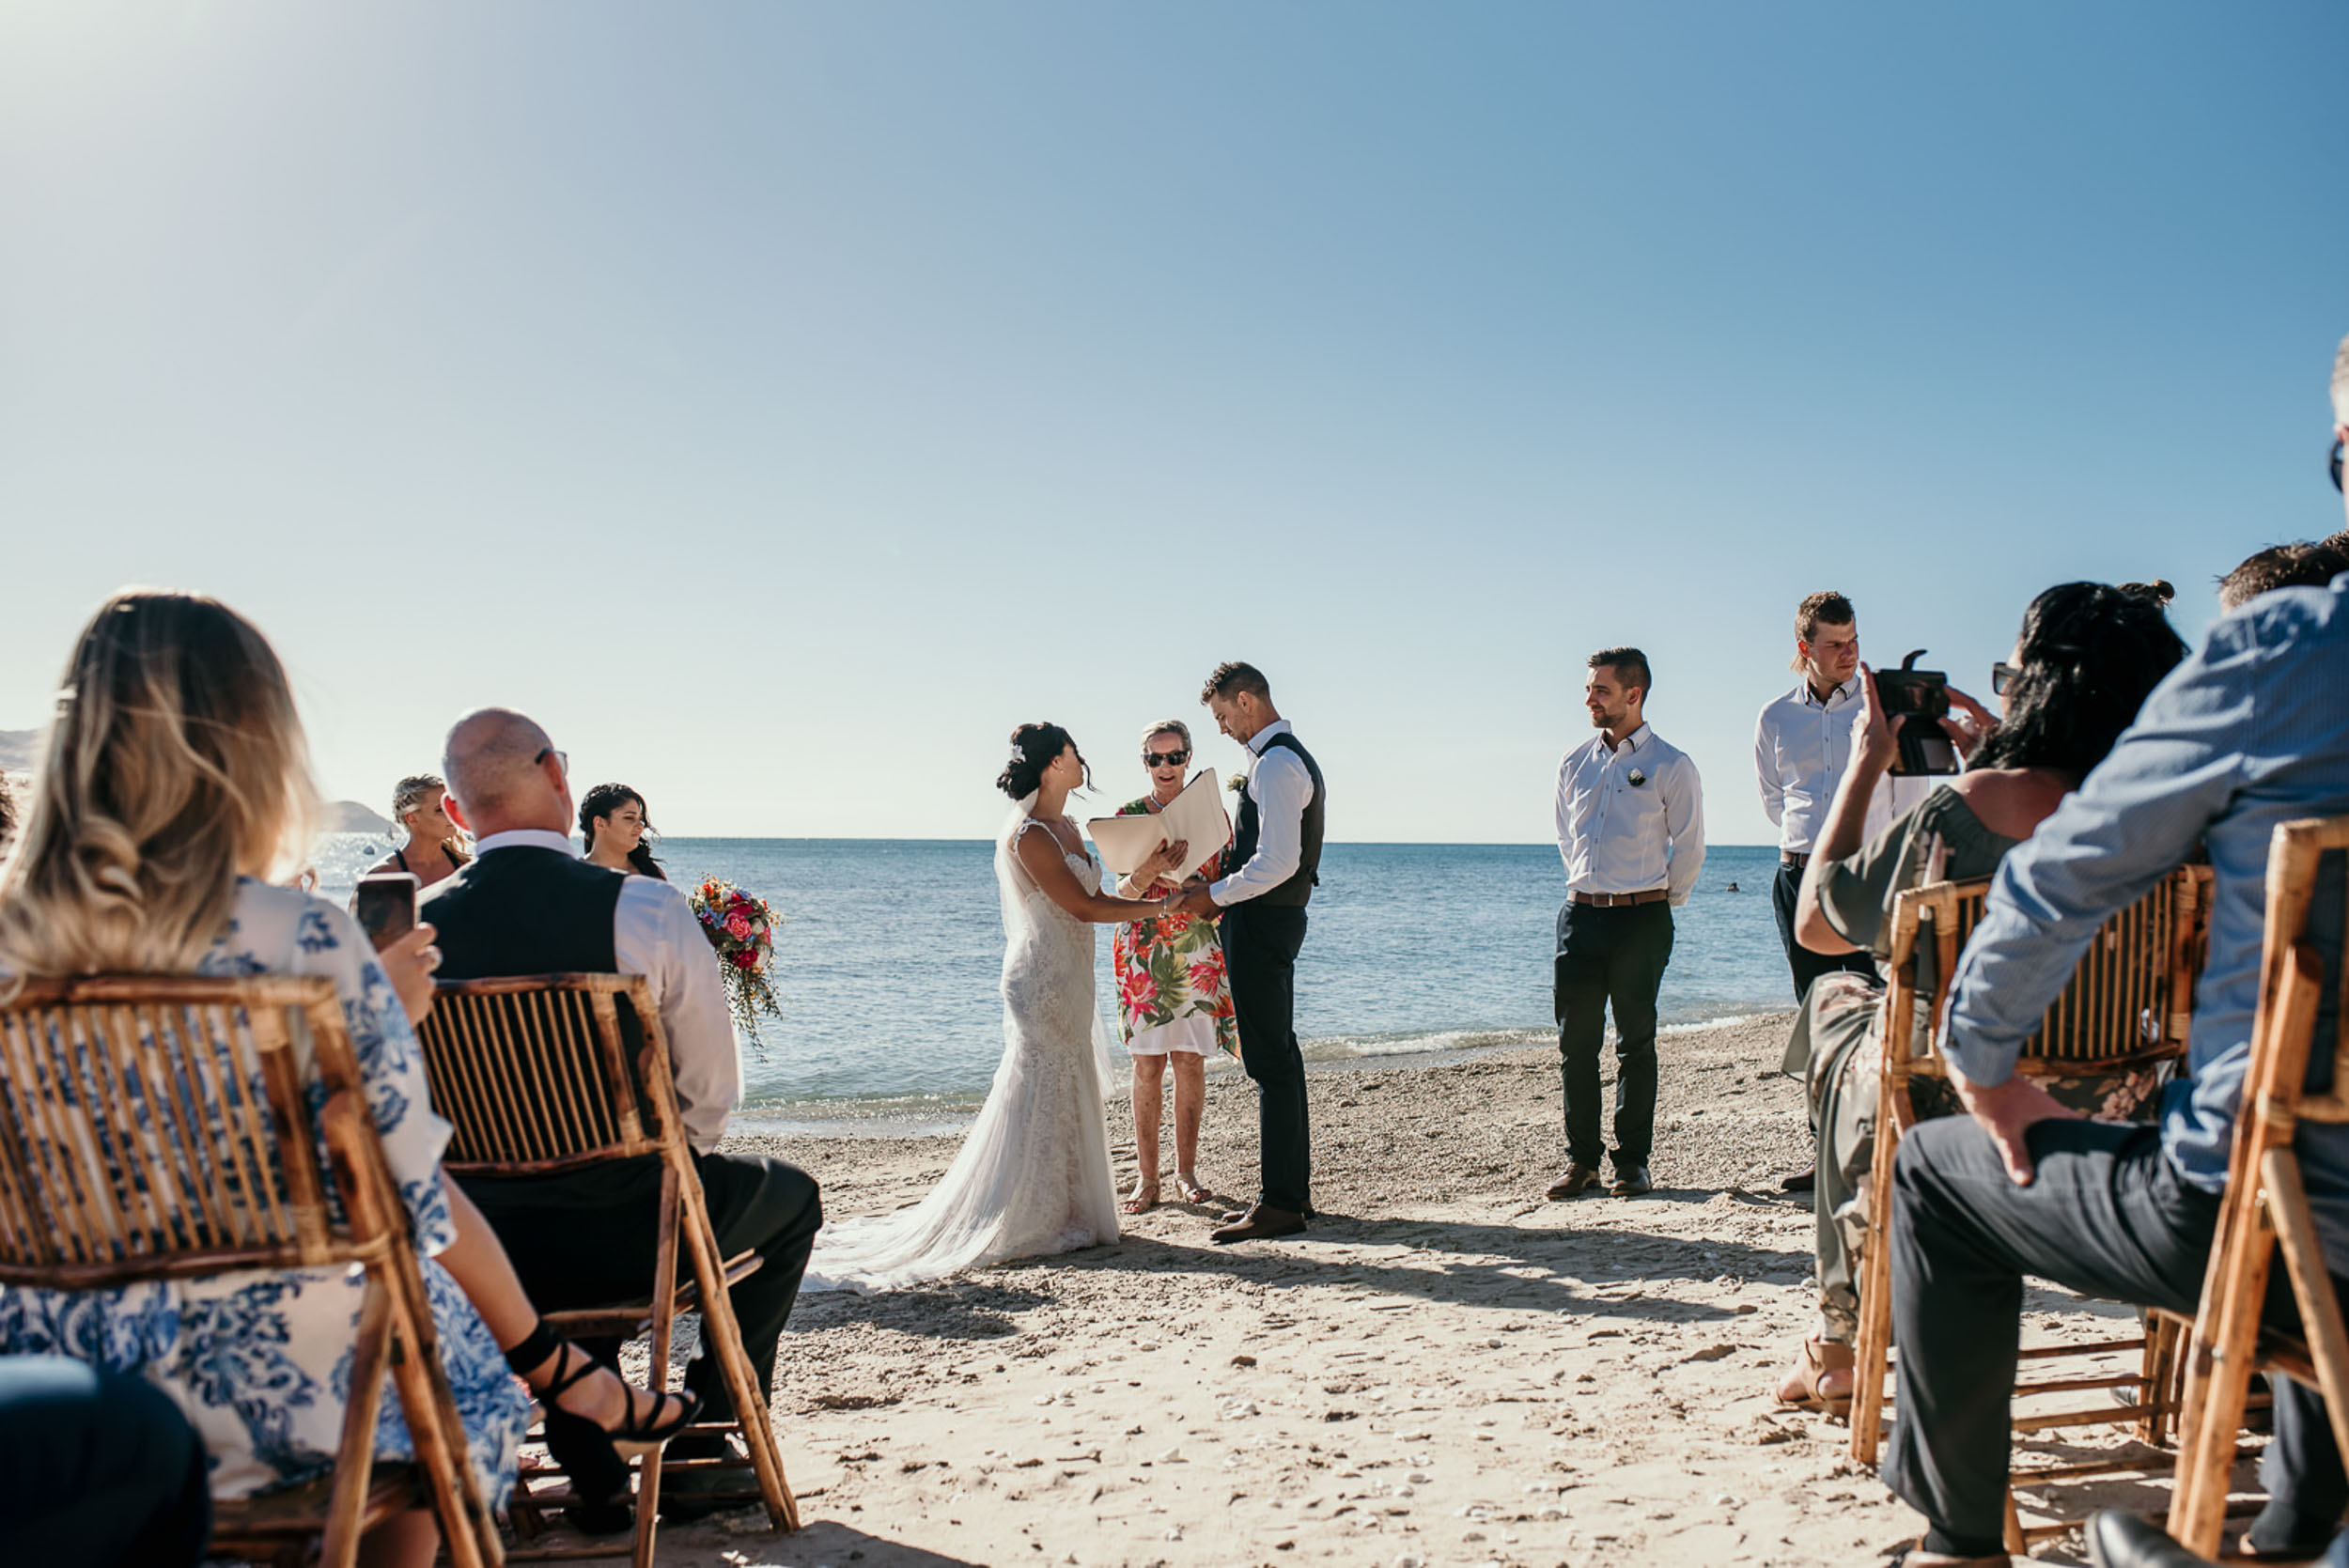 The Raw Photographer - Cairns Wedding Photographer - Fitzroy Island - Destination Wedding - Bride Dress - Groom Portrait - Queensland-20.jpg